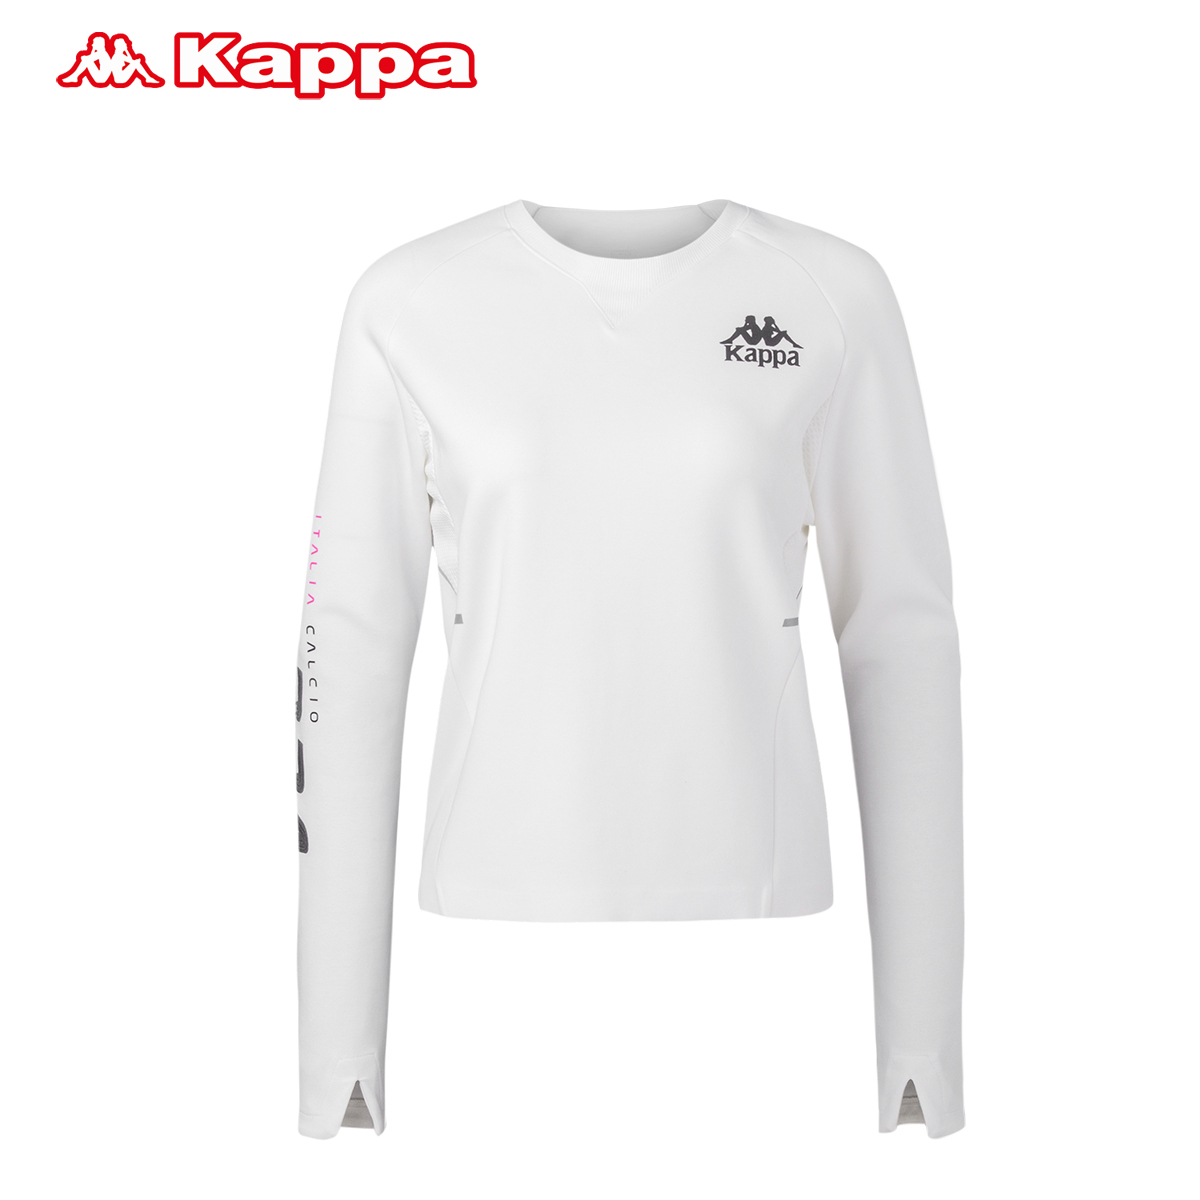 Kappa 女卫衣运动服 卡帕圆领套头衫 女装长袖运动外套|K0762WT01